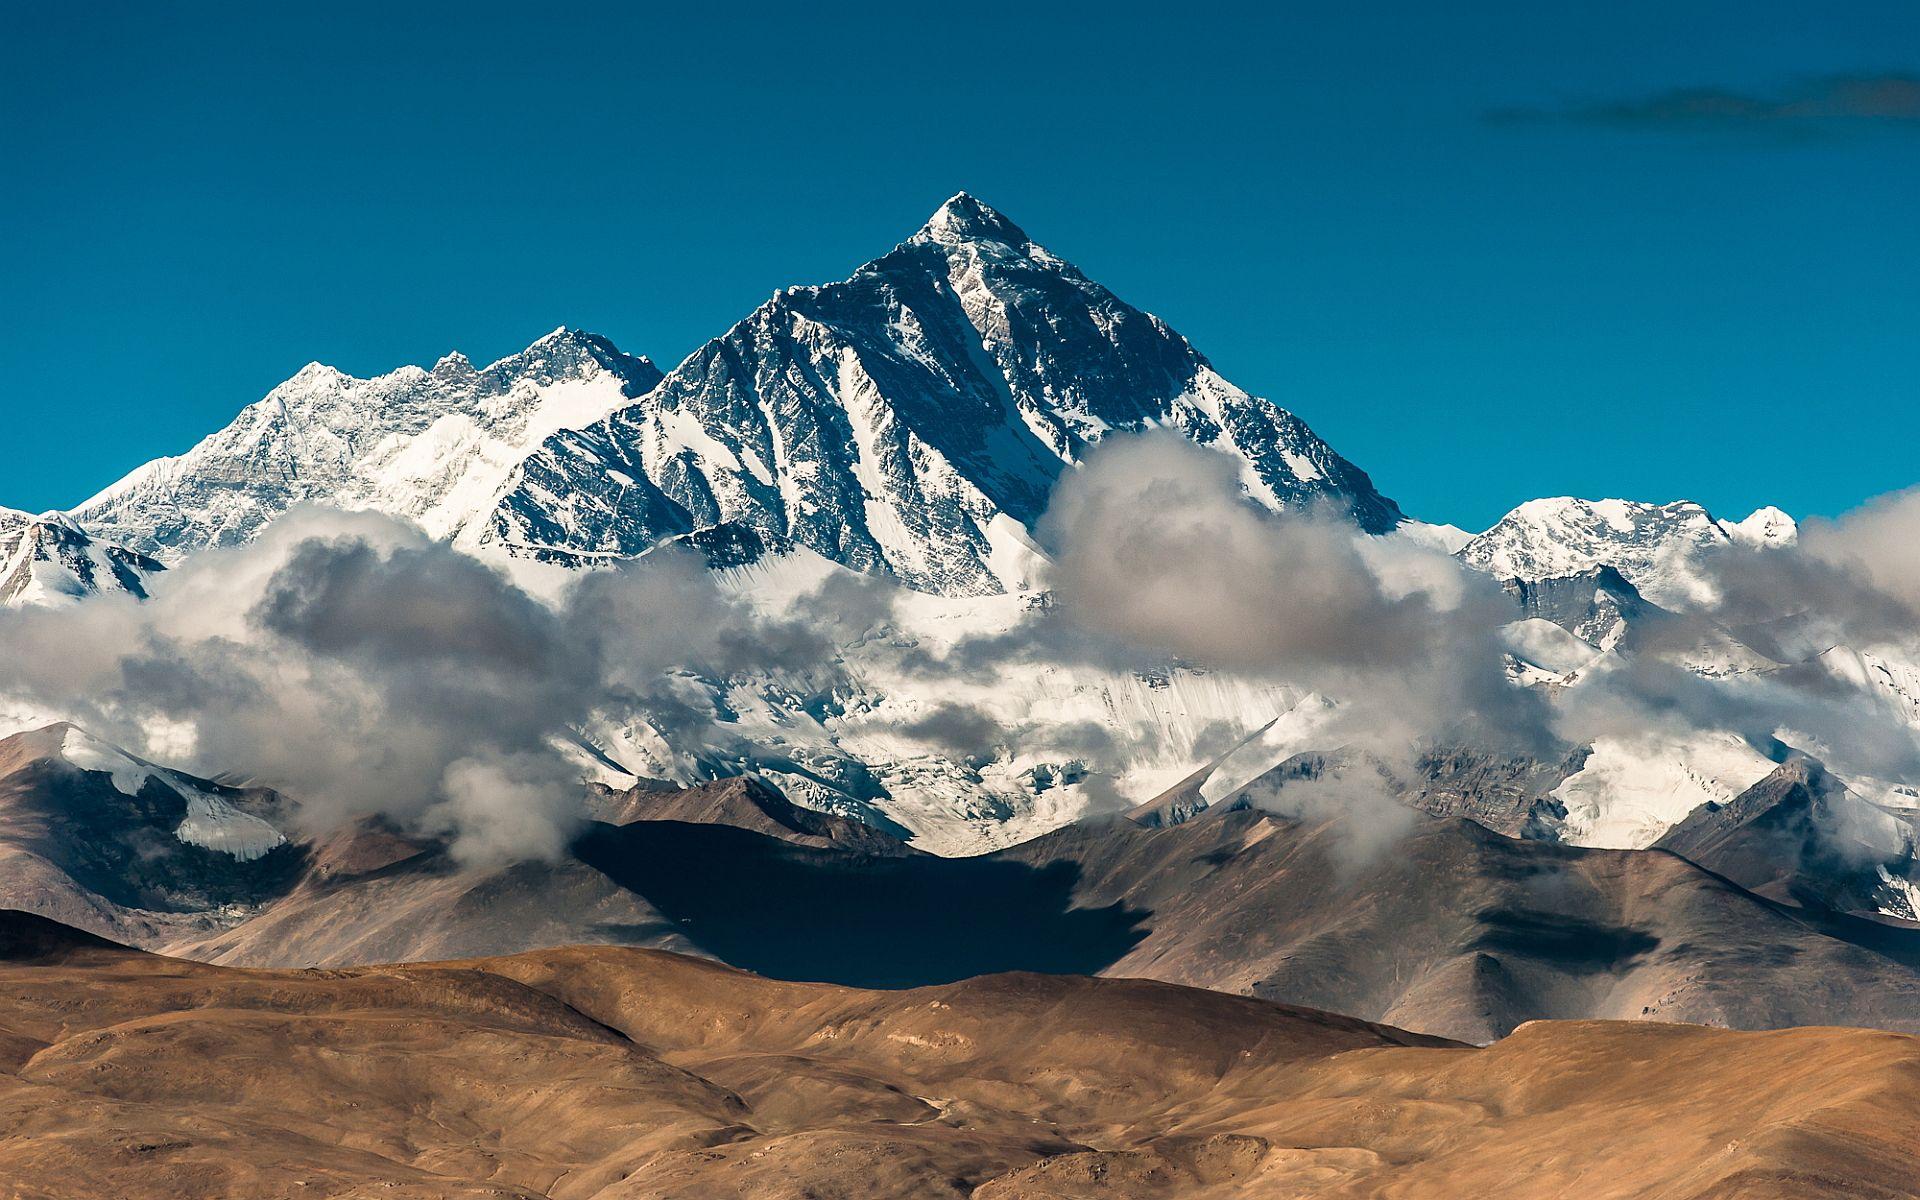 photos of tibet | tibet everest wallpapers pictures photos images